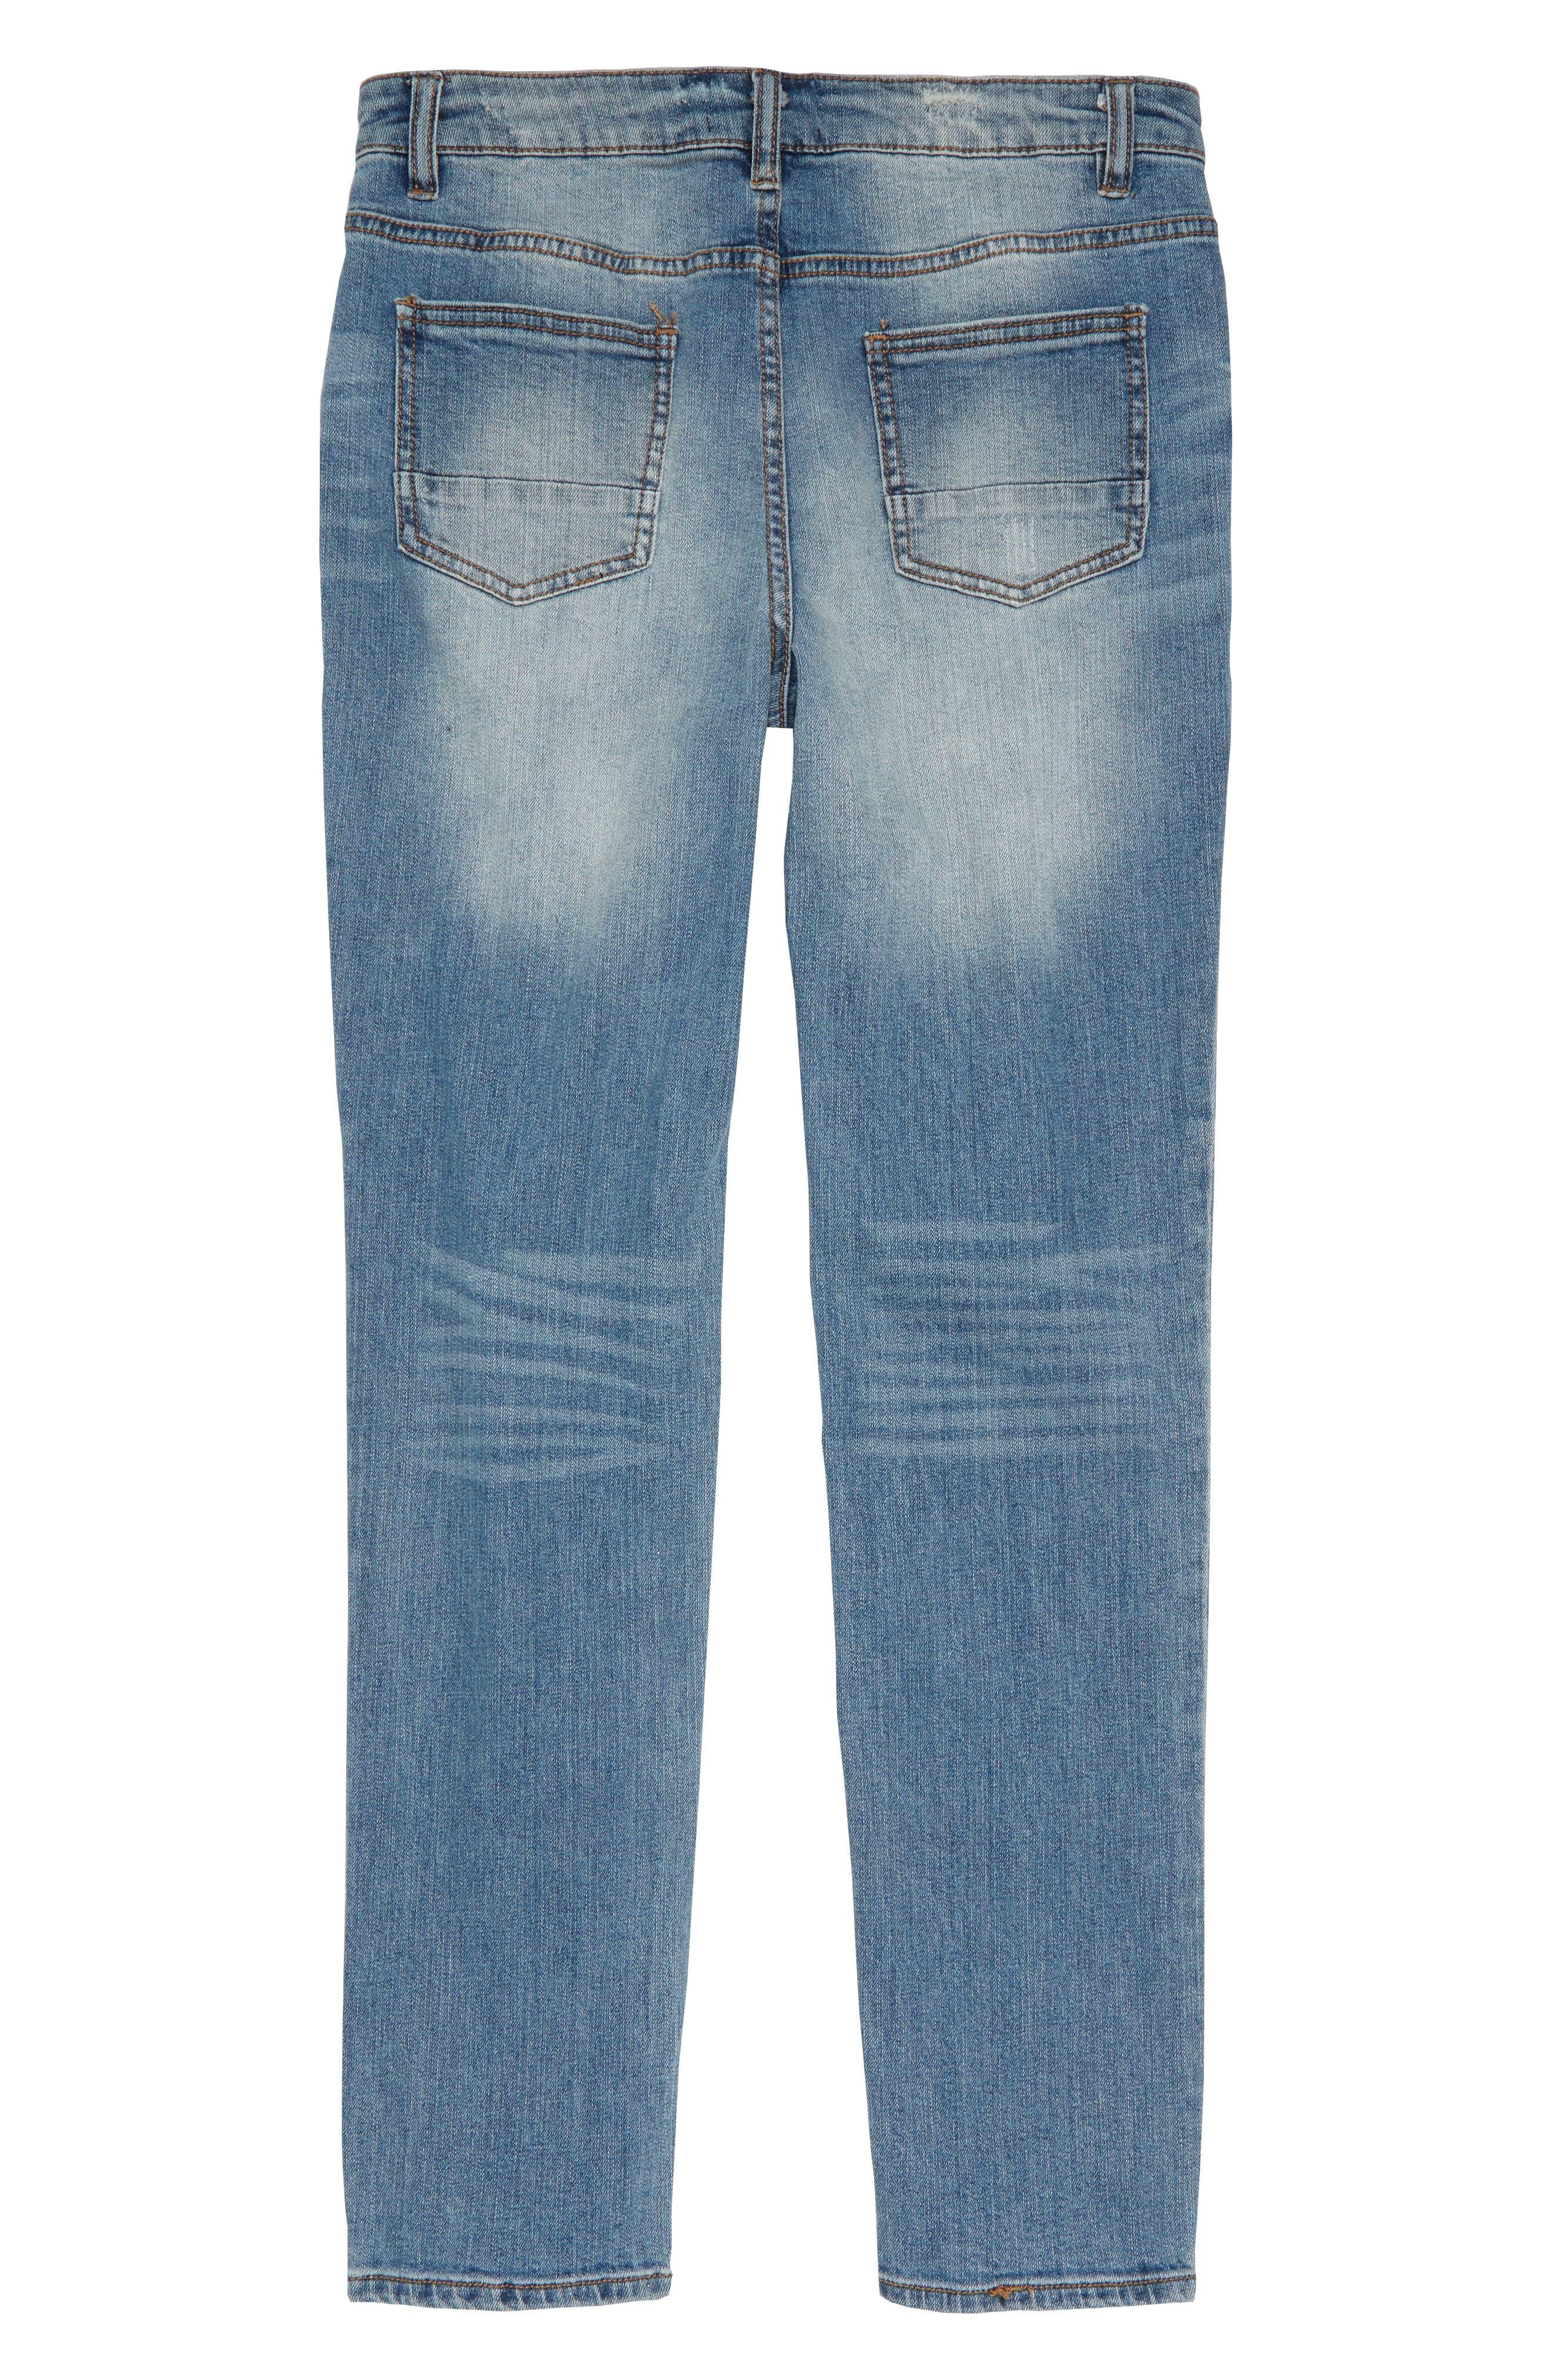 Elwood Pieced Skinny Jeans,                             Alternate thumbnail 2, color,                             424